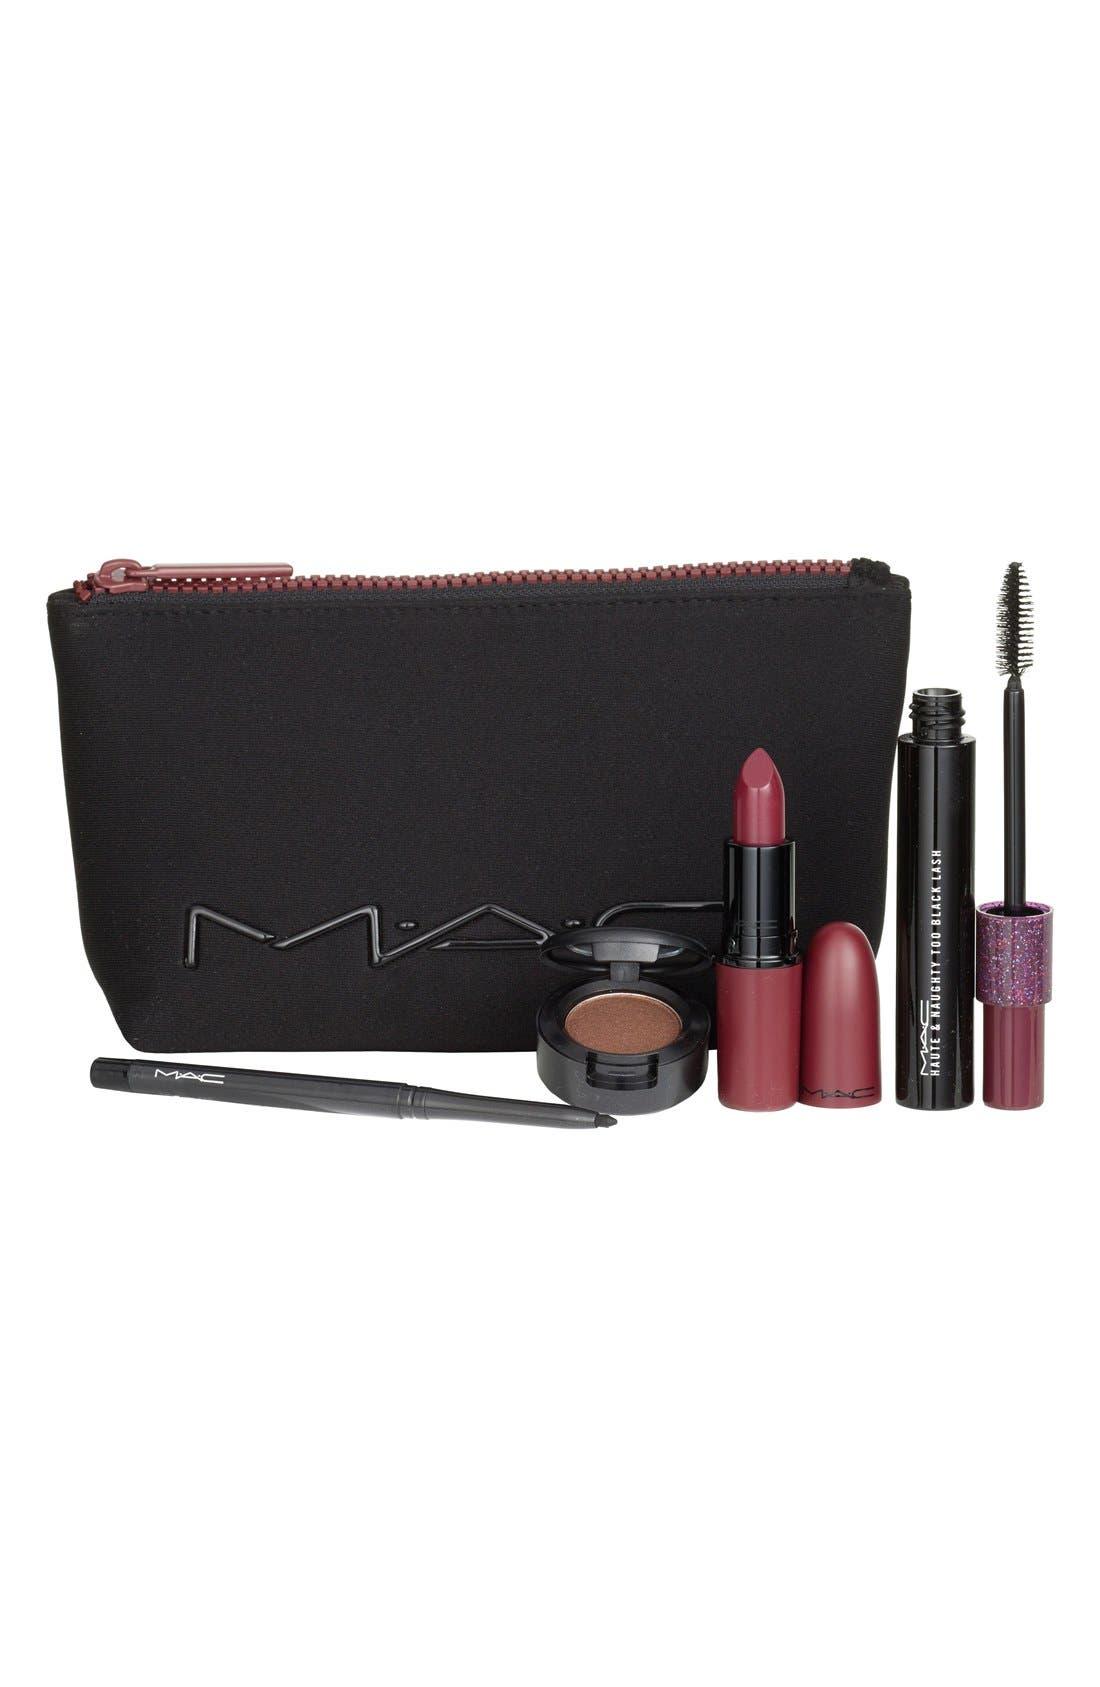 MAC 'Look in a Box - Sassy Siren' Burgundy Lip & Eye Kit,                             Main thumbnail 1, color,                             No Color